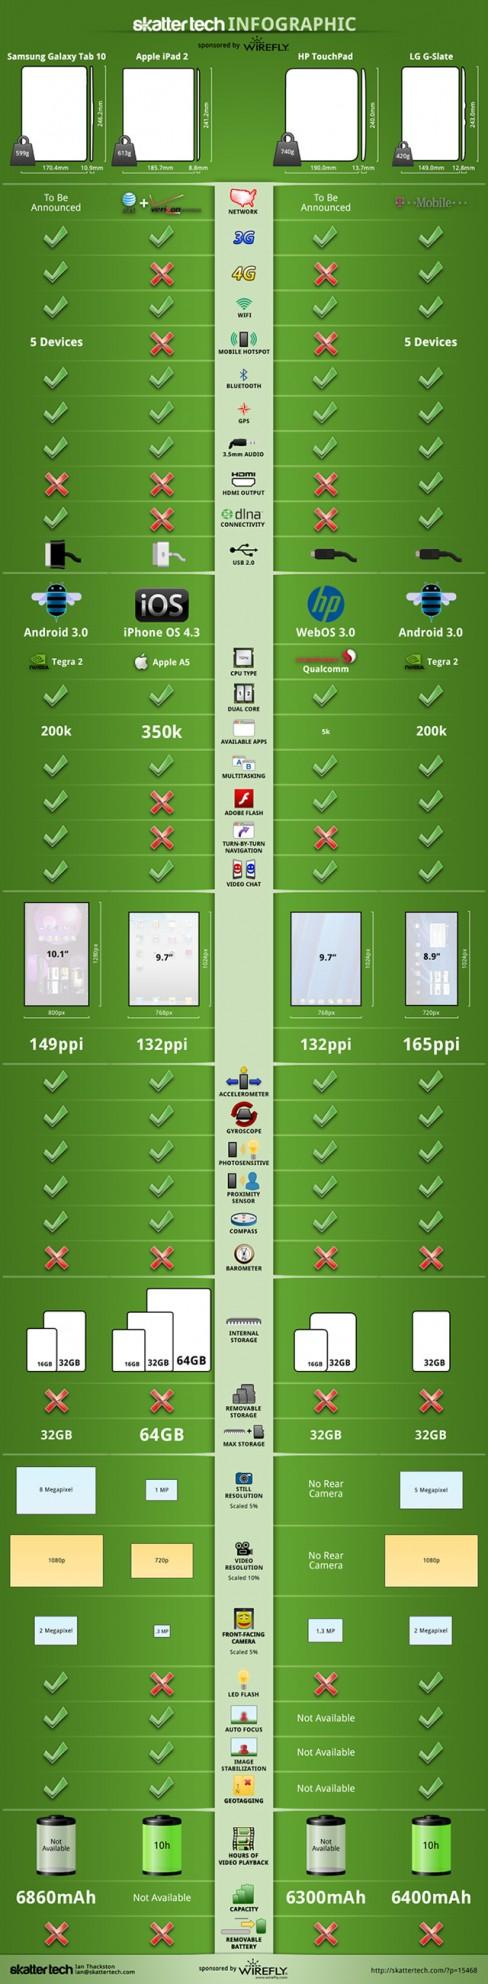 Hacks Hub Infographic: Samsung Galaxy Tab 10.1 vs. Apple iPad 2 vs. HP TouchPad vs. LG G-Slate